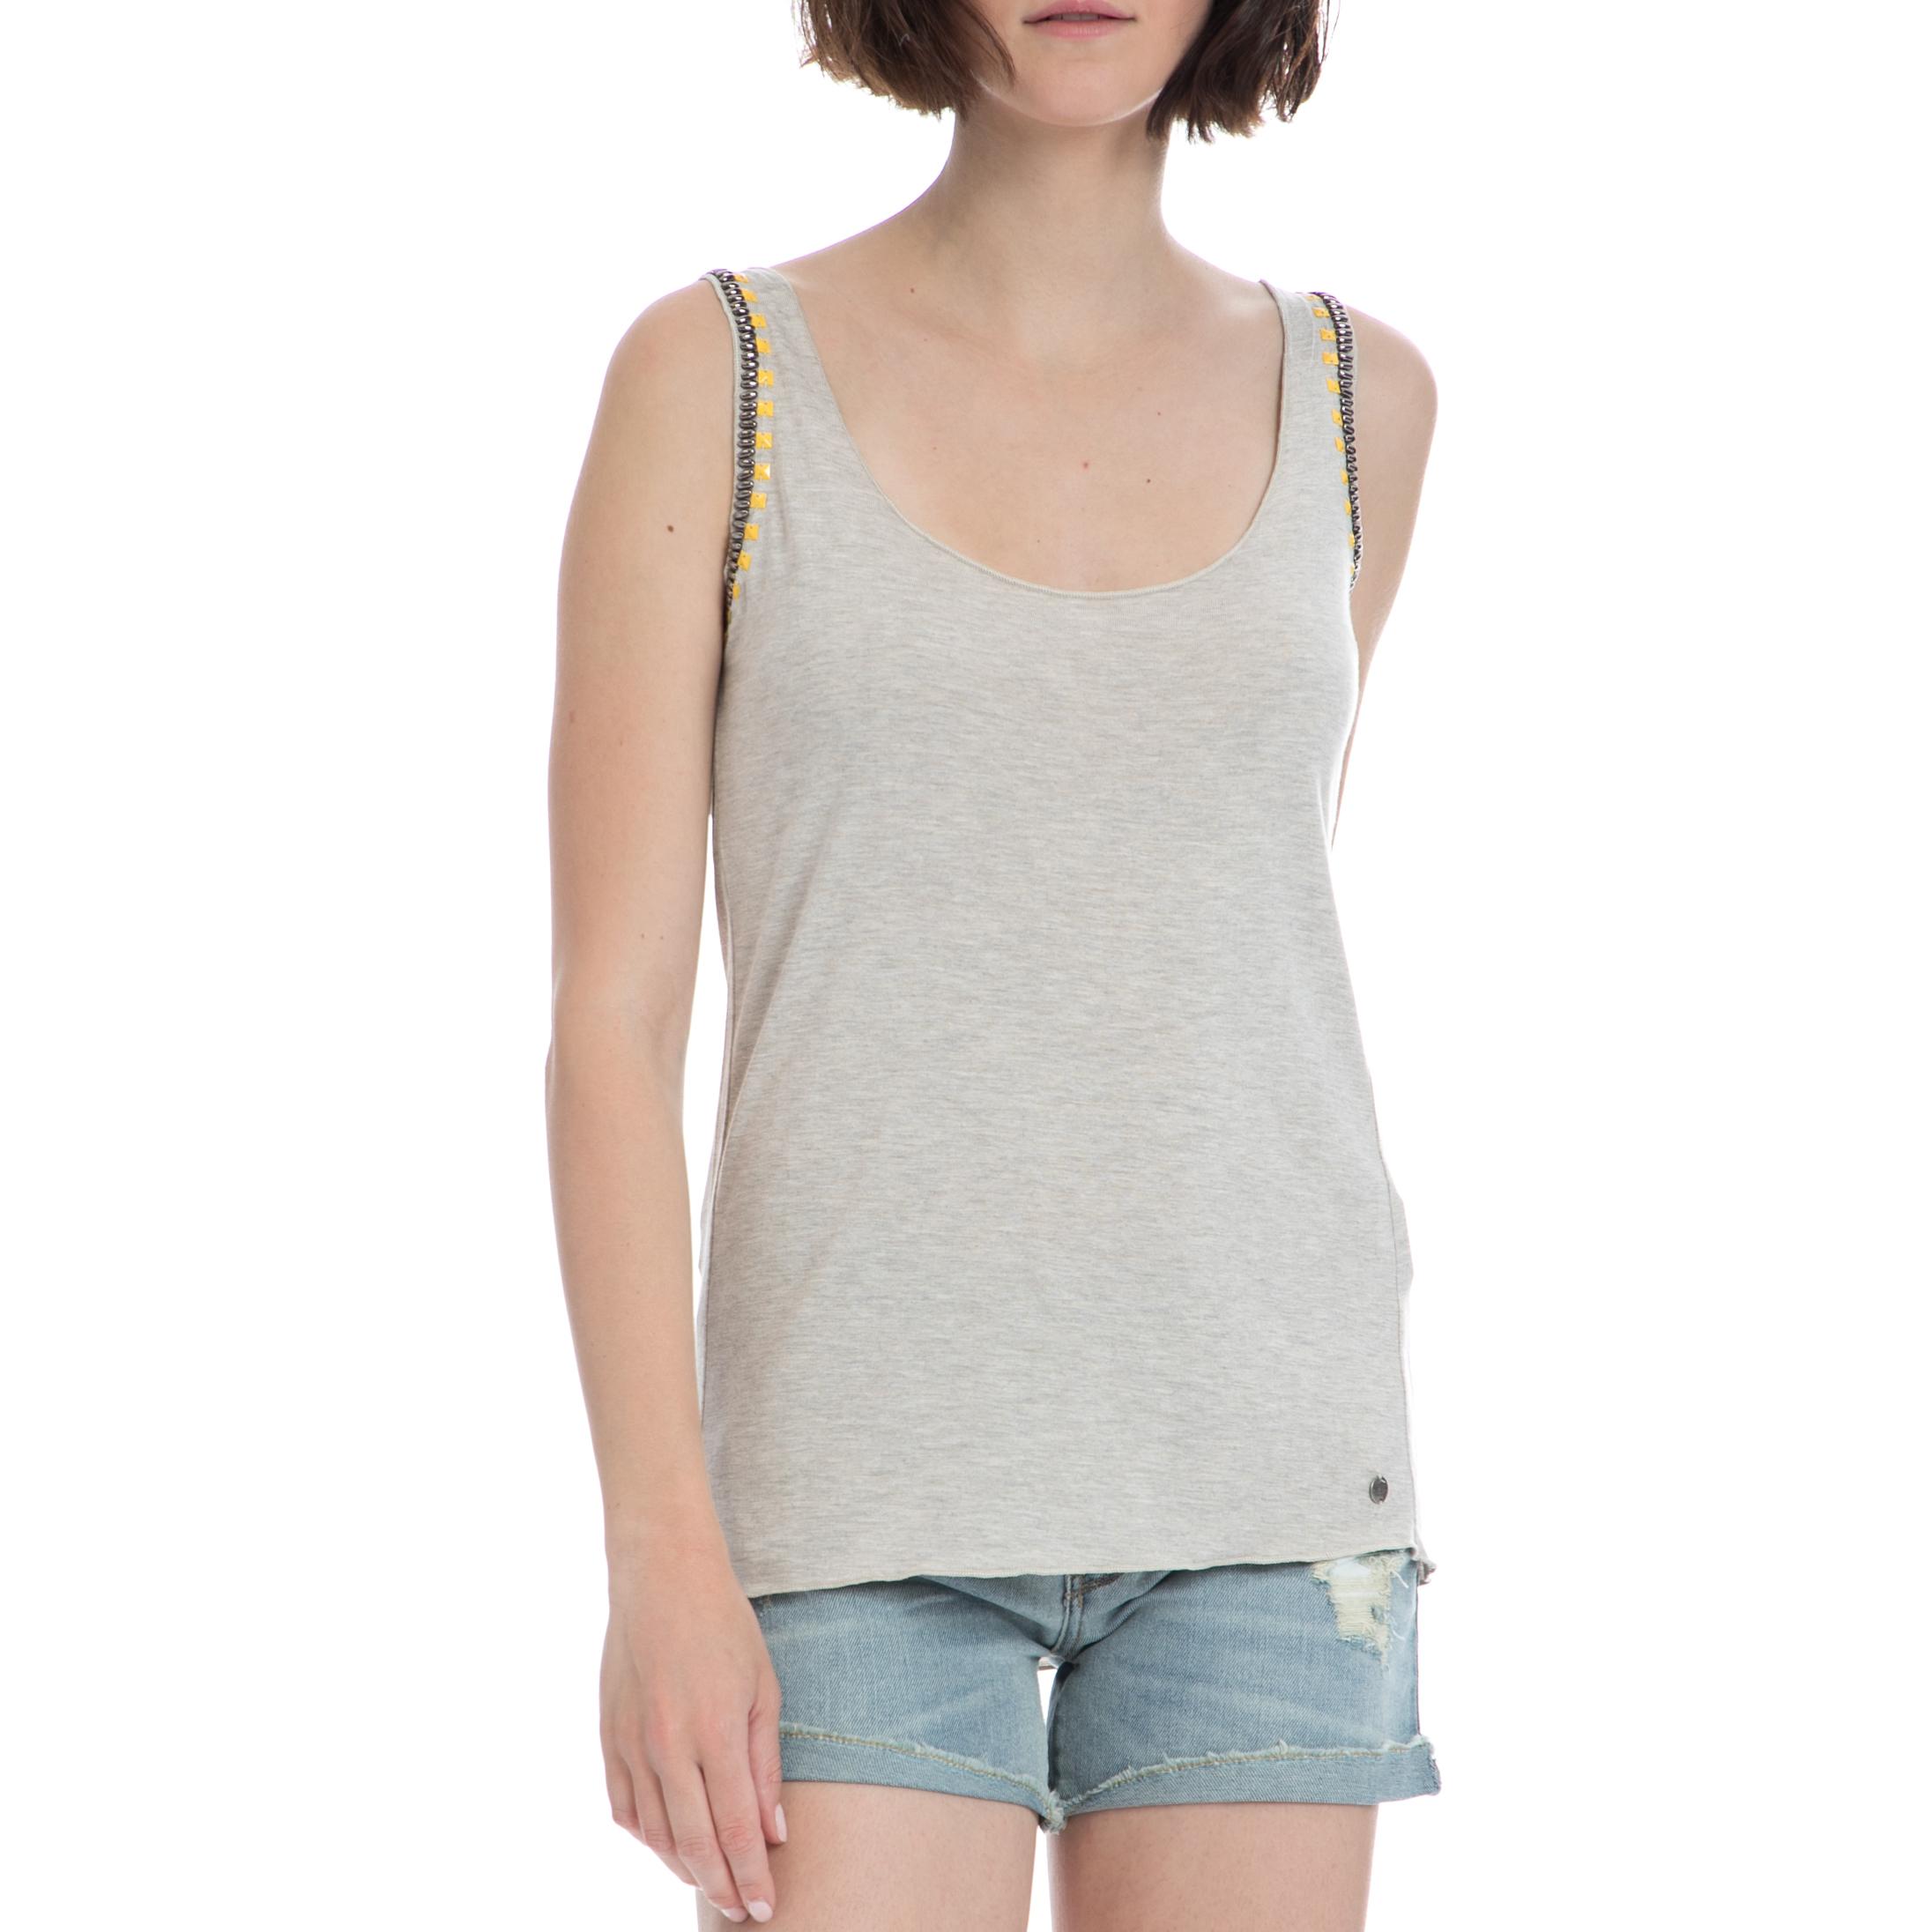 GARCIA JEANS – Γυναικείο τοπ Garcia Jeans γκρι